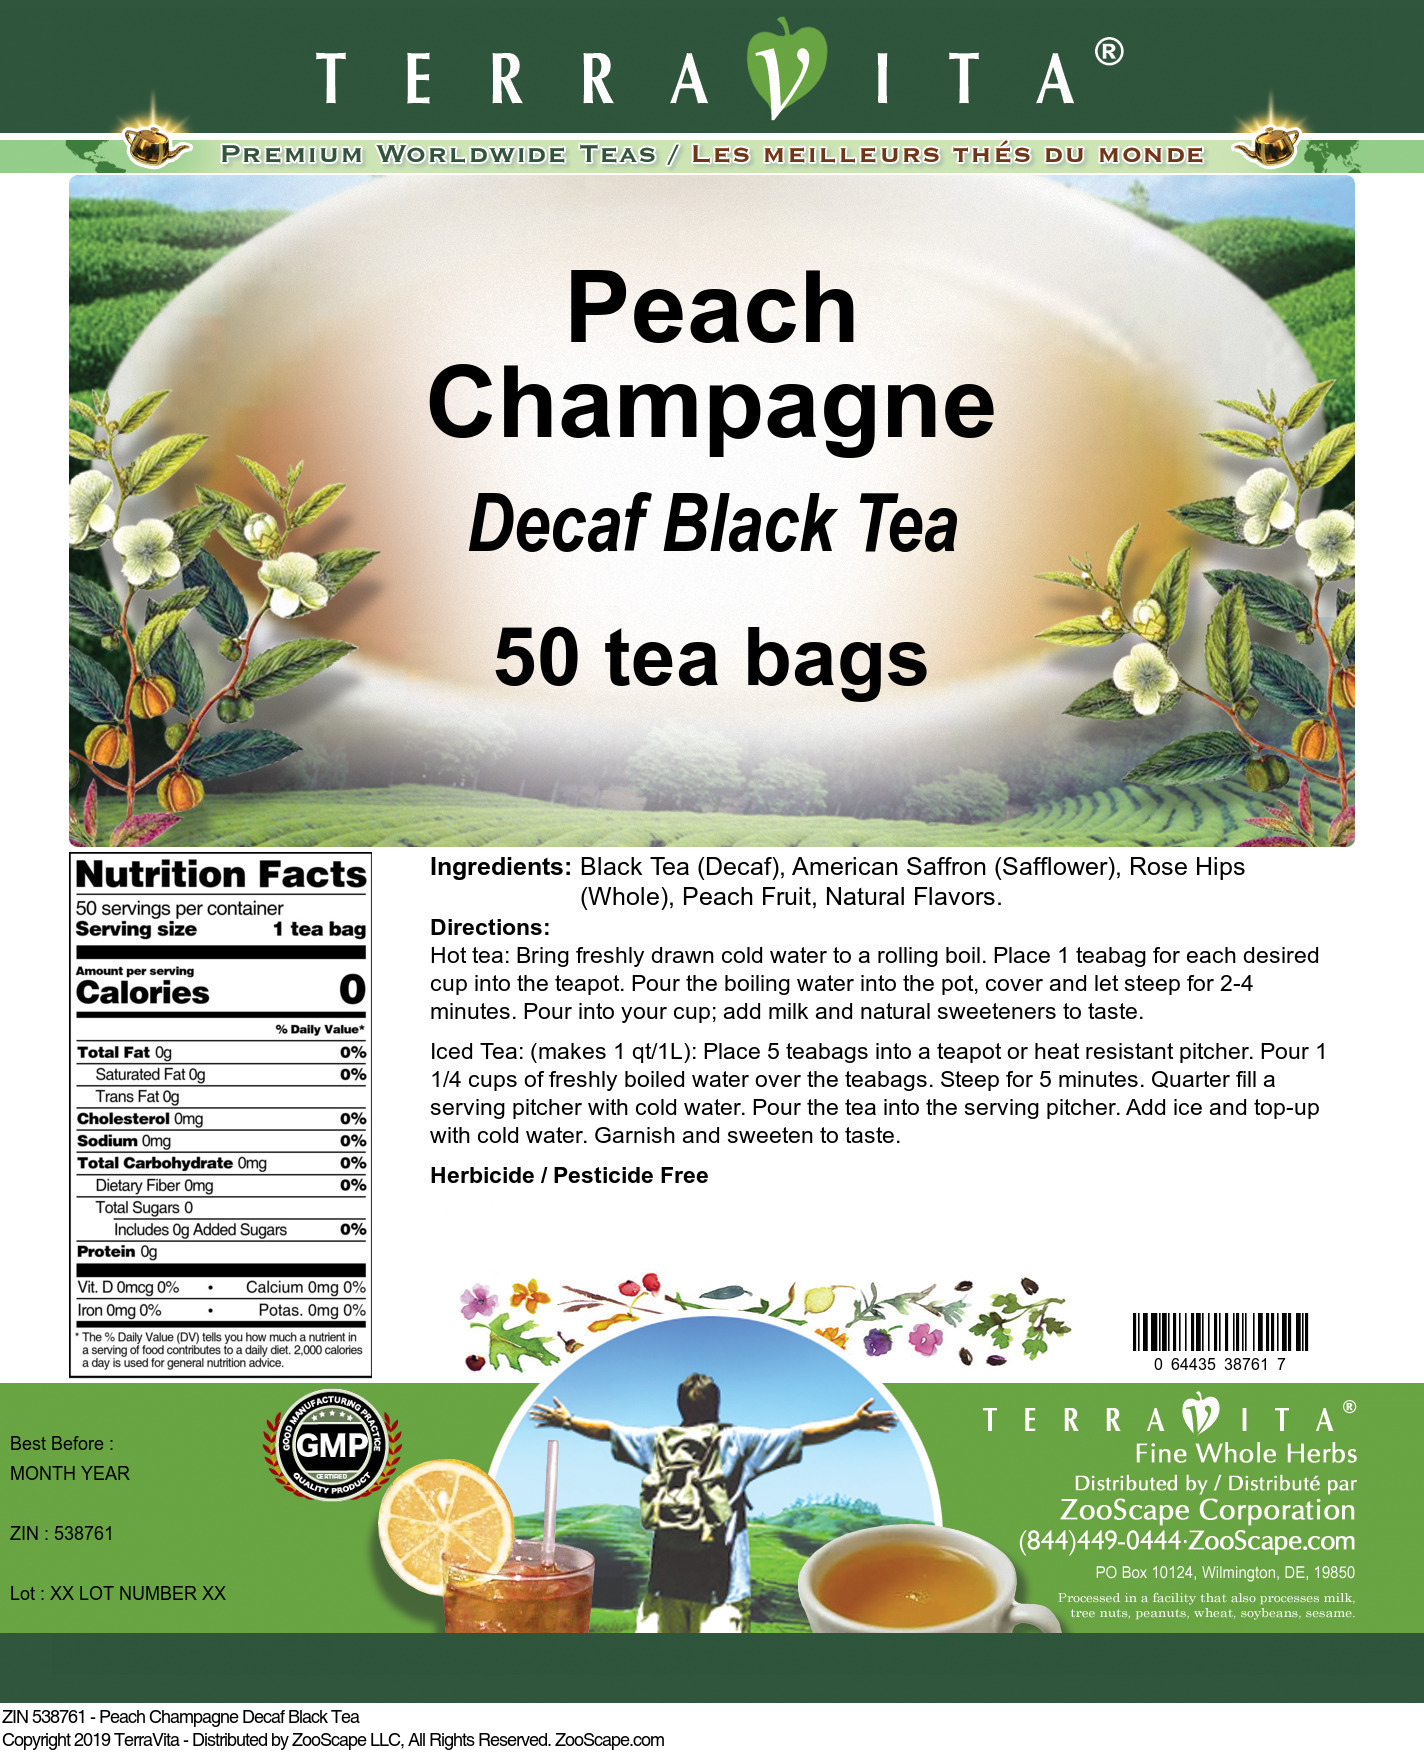 Peach Champagne Decaf Black Tea